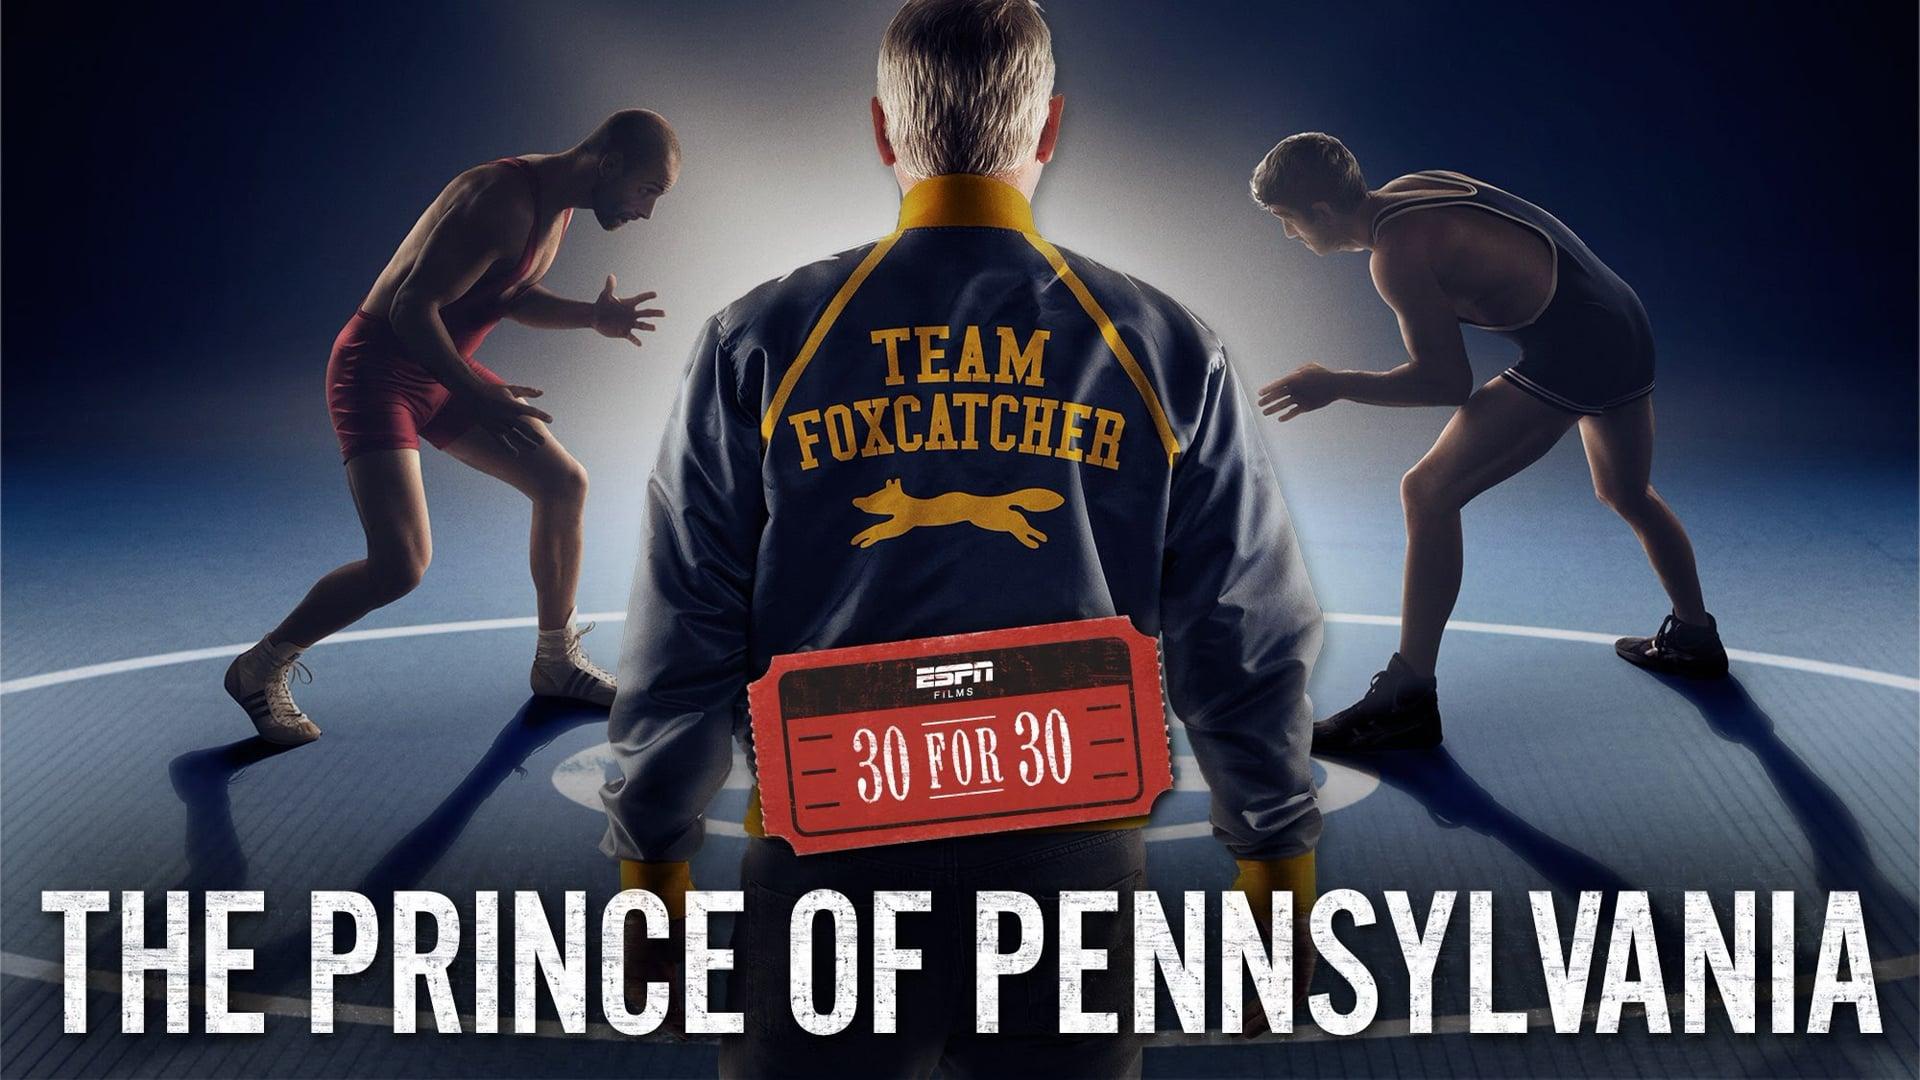 The Prince of Pennsylvania Trailer